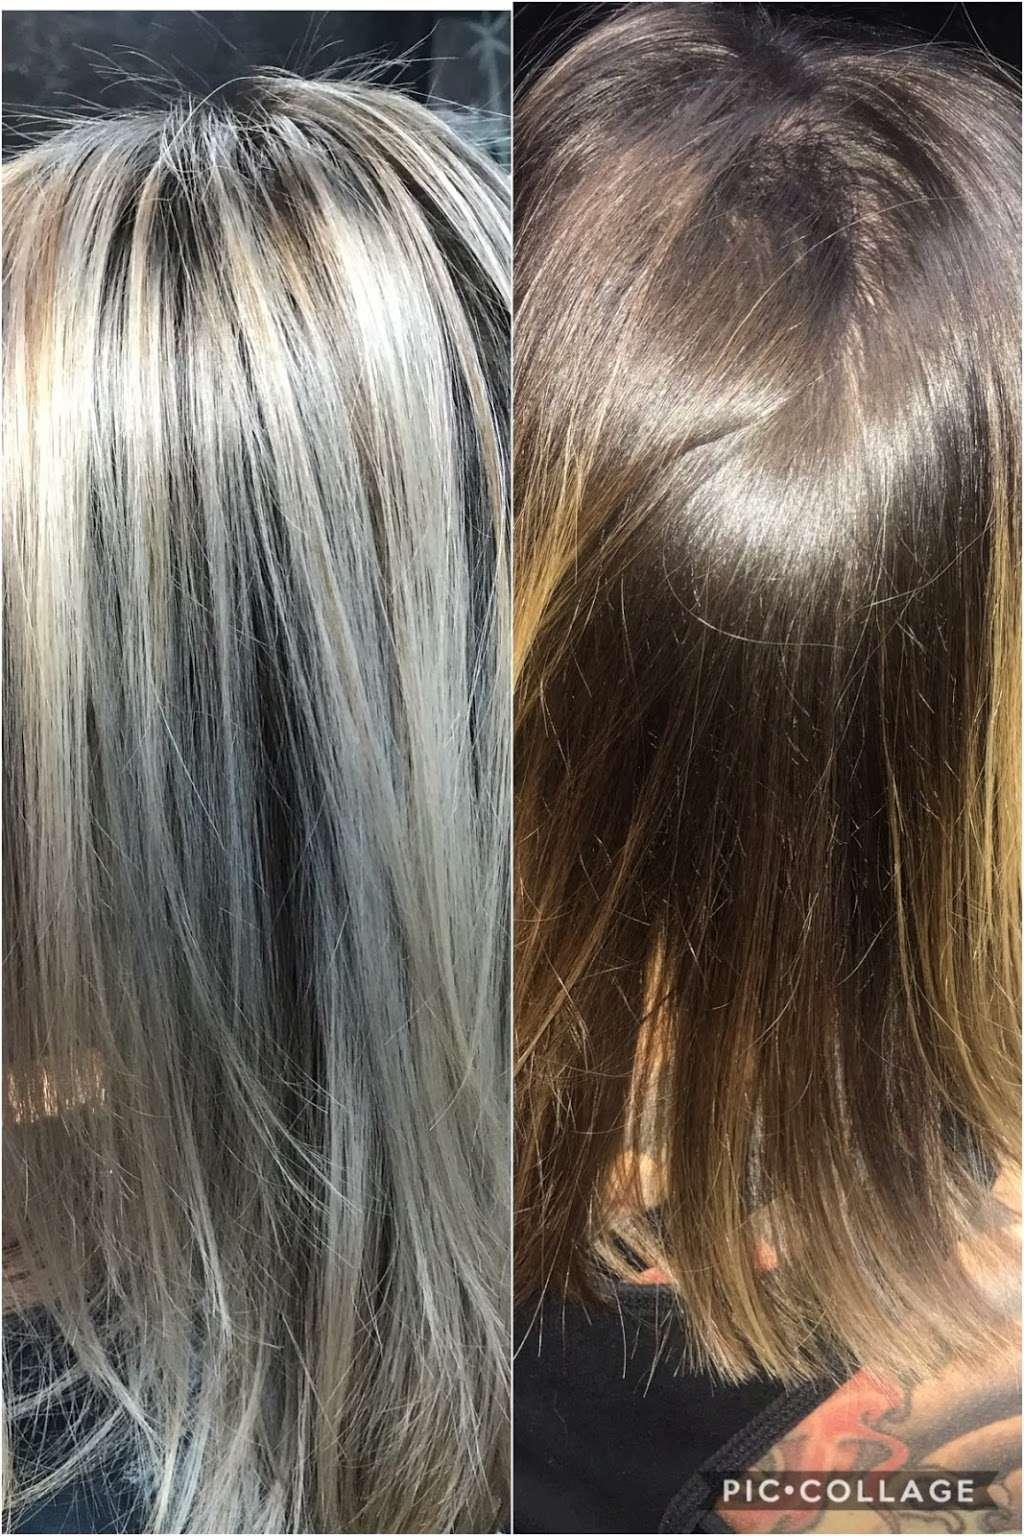 Jan Fher Hair Designer studio - hair care    Photo 8 of 10   Address: 842 S Galloway Ave, Mesquite, TX 75149, USA   Phone: (972) 322-9373